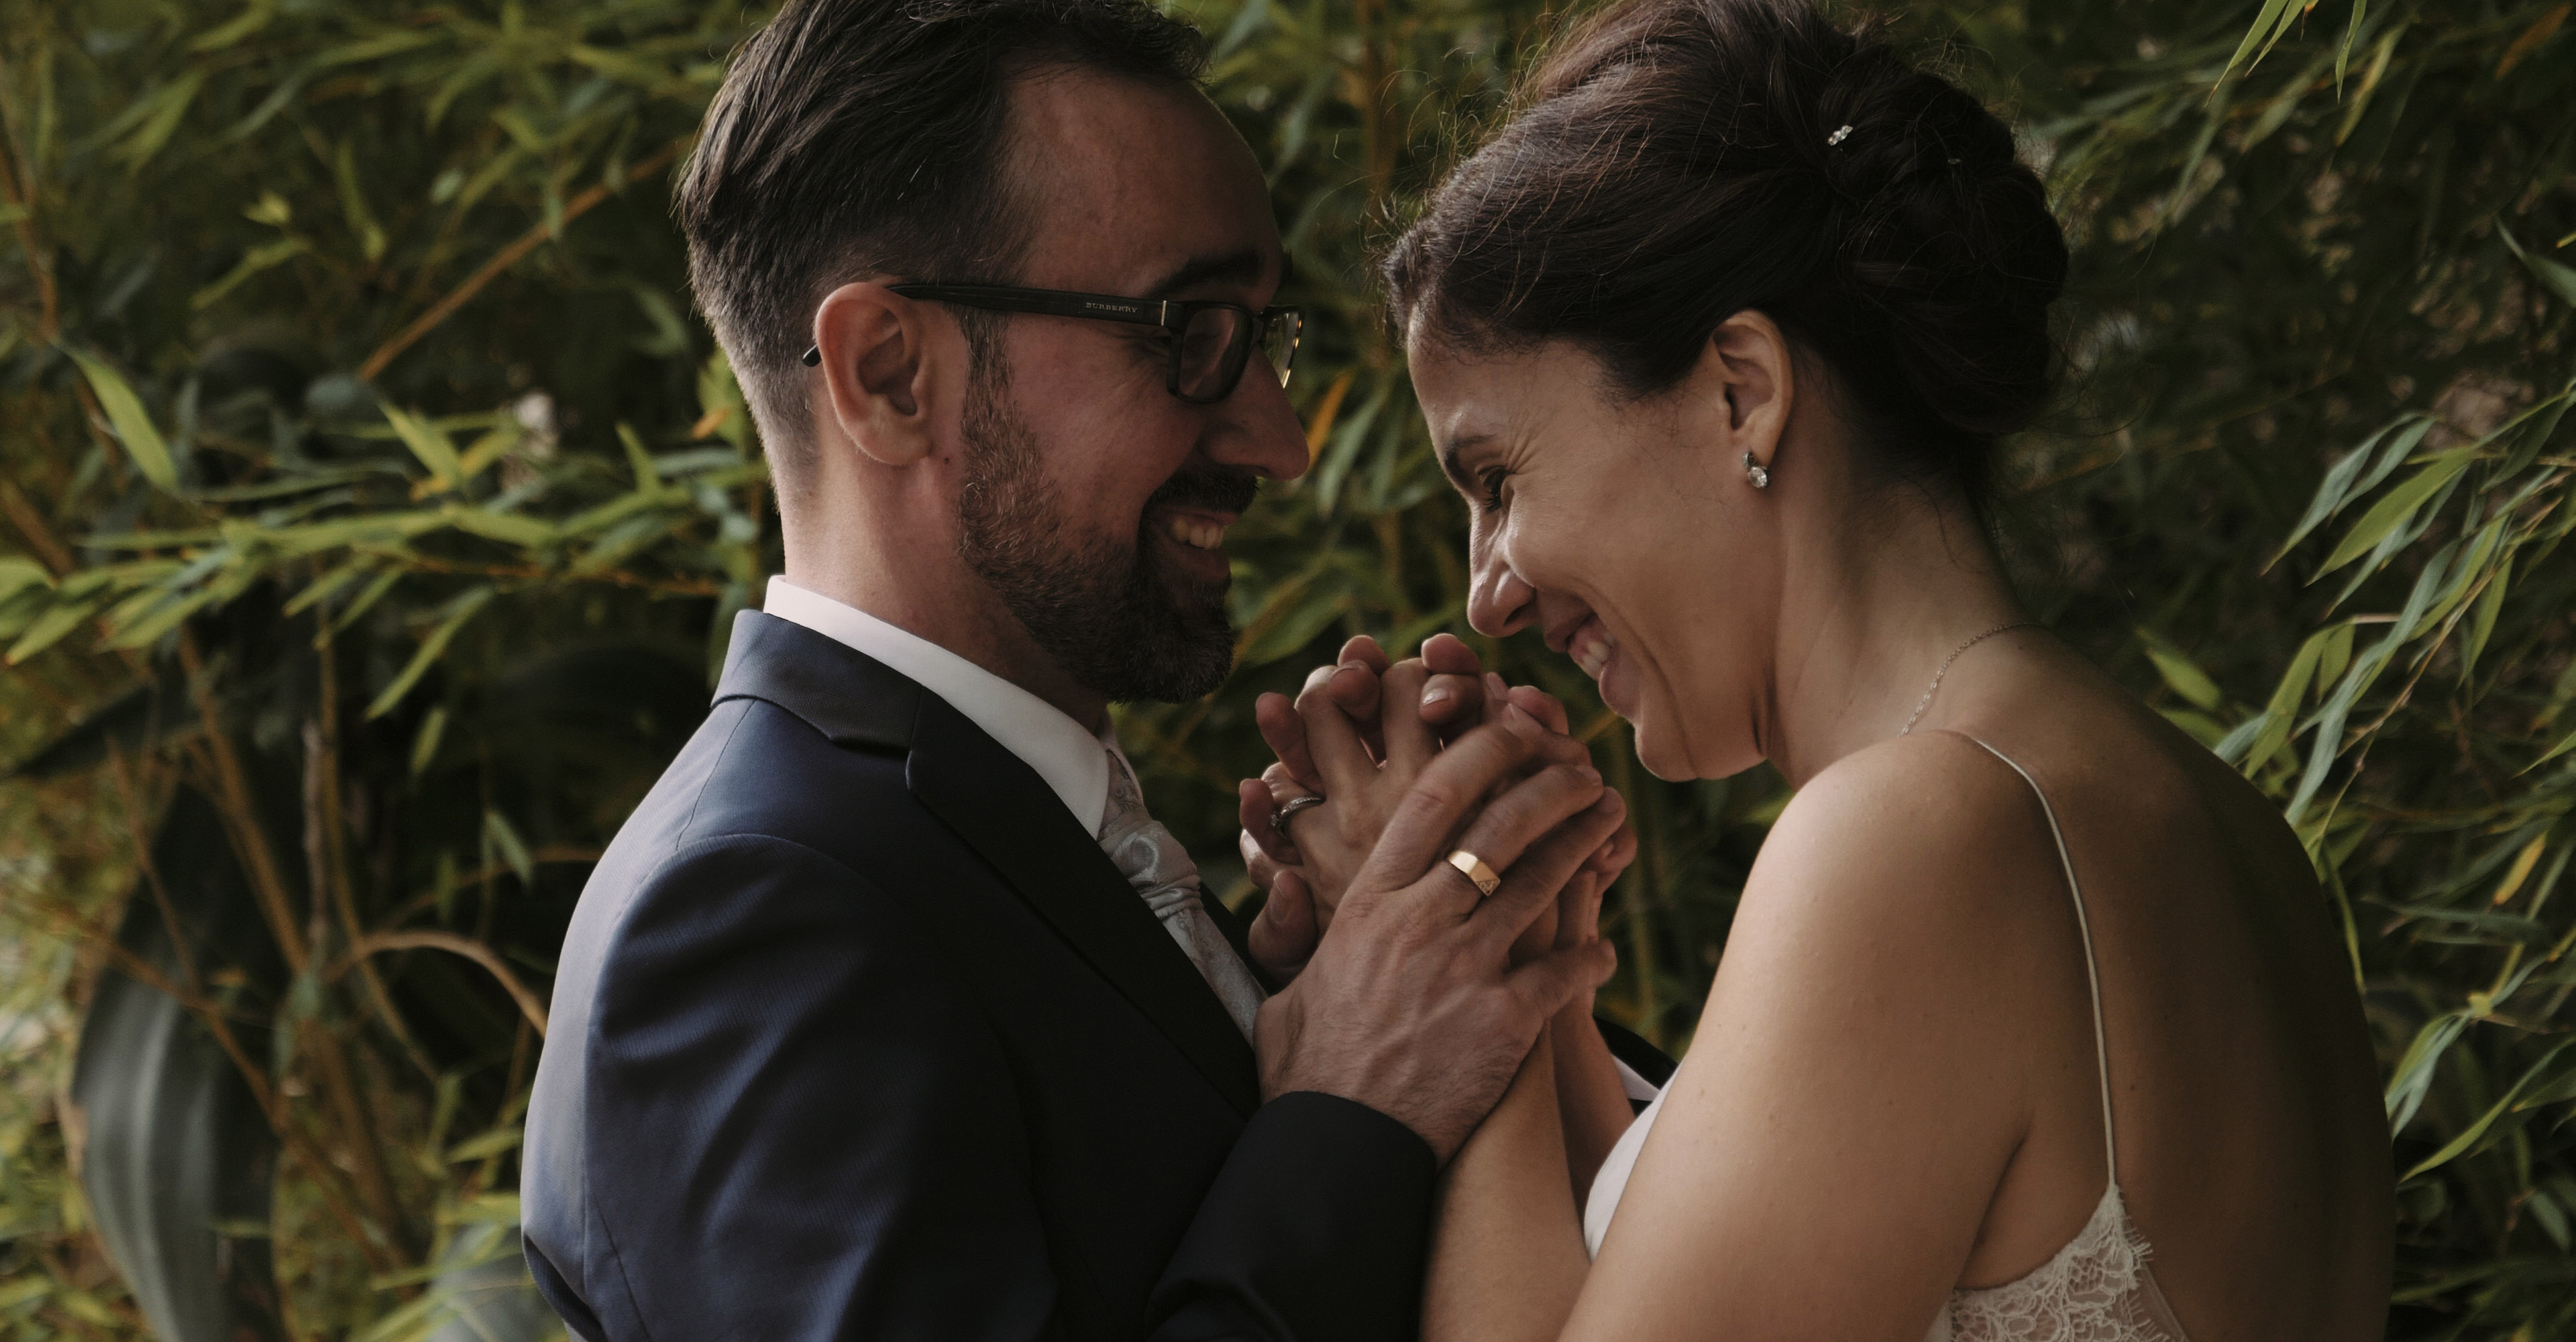 Cécile & Ludovic | Camille | Alicia - Wedding + Baptism